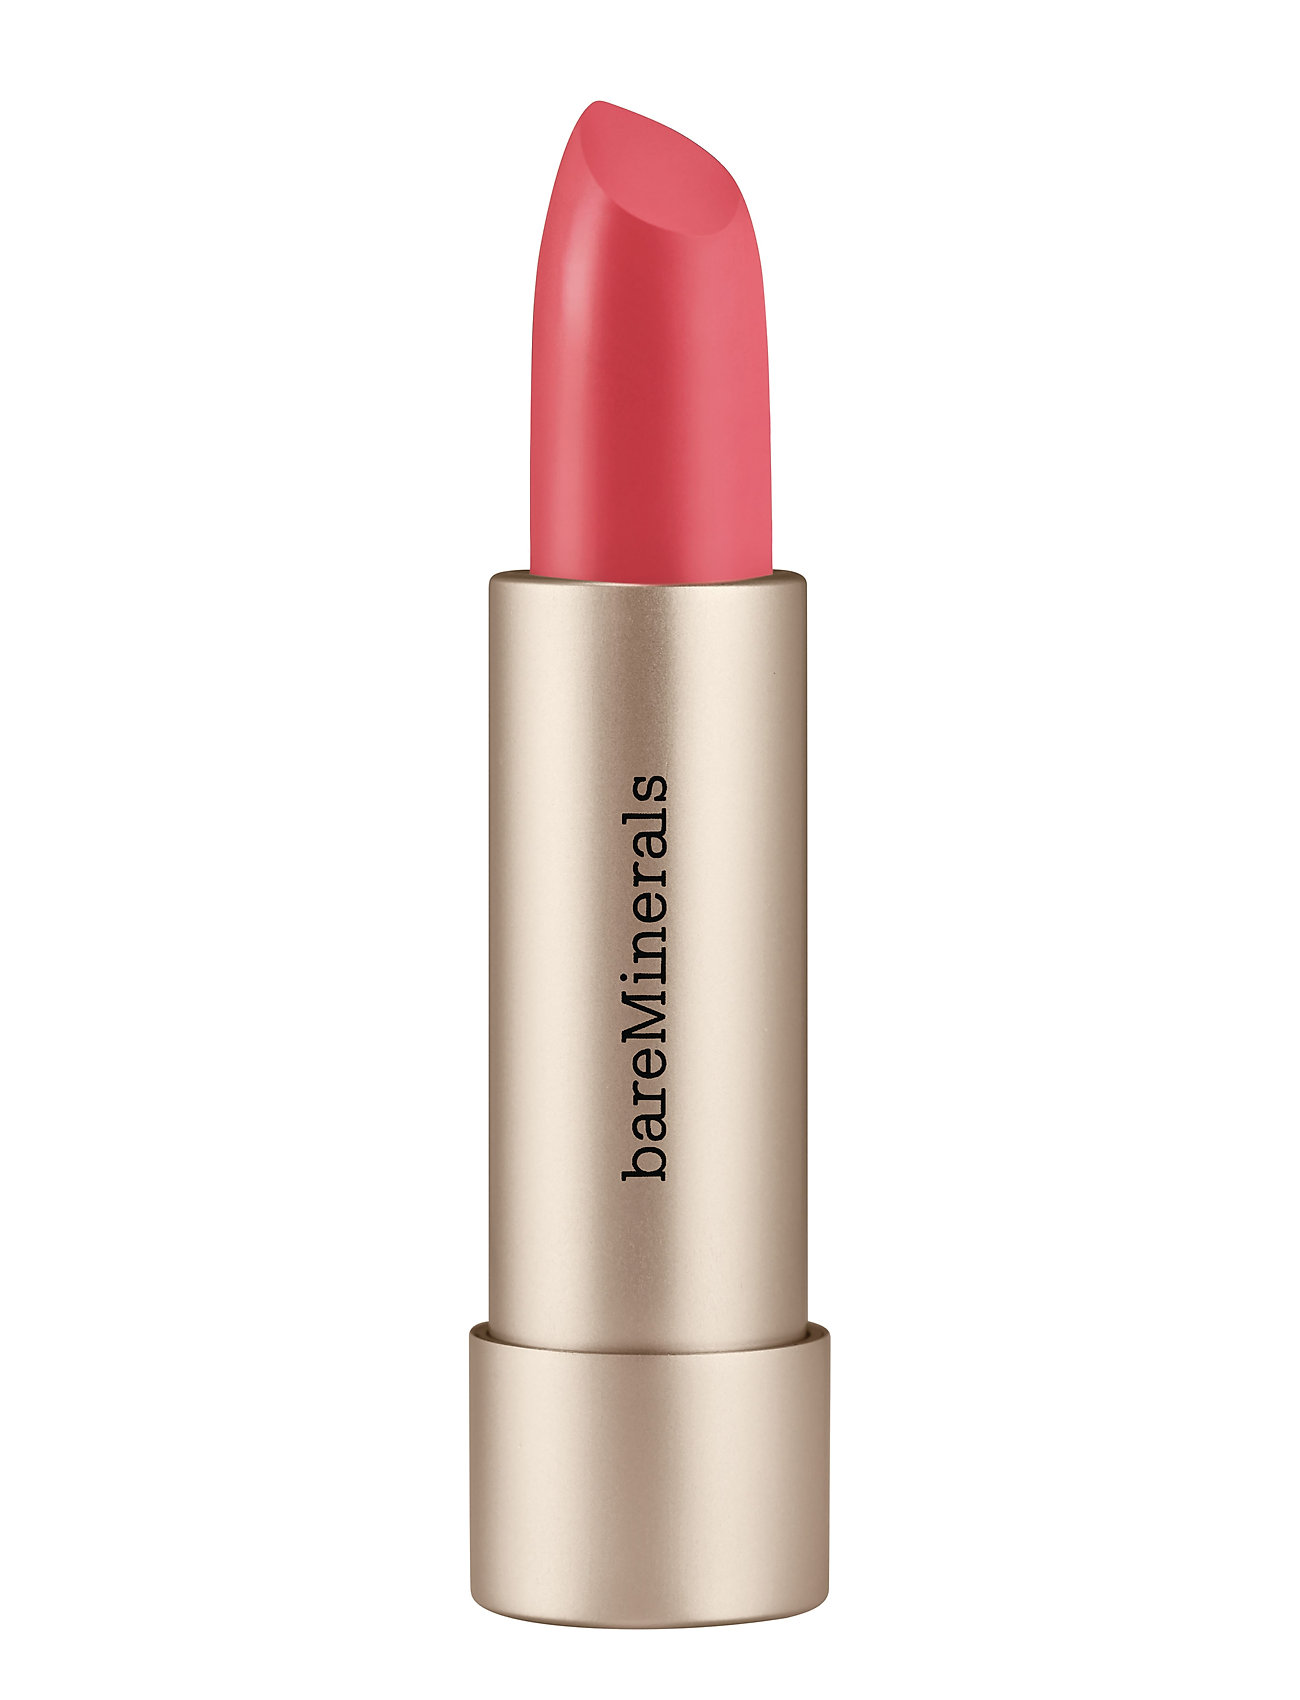 Image of Mineralist Hydra-Smoothing Lipstick Abundance Læbestift Makeup BareMinerals (3418623933)